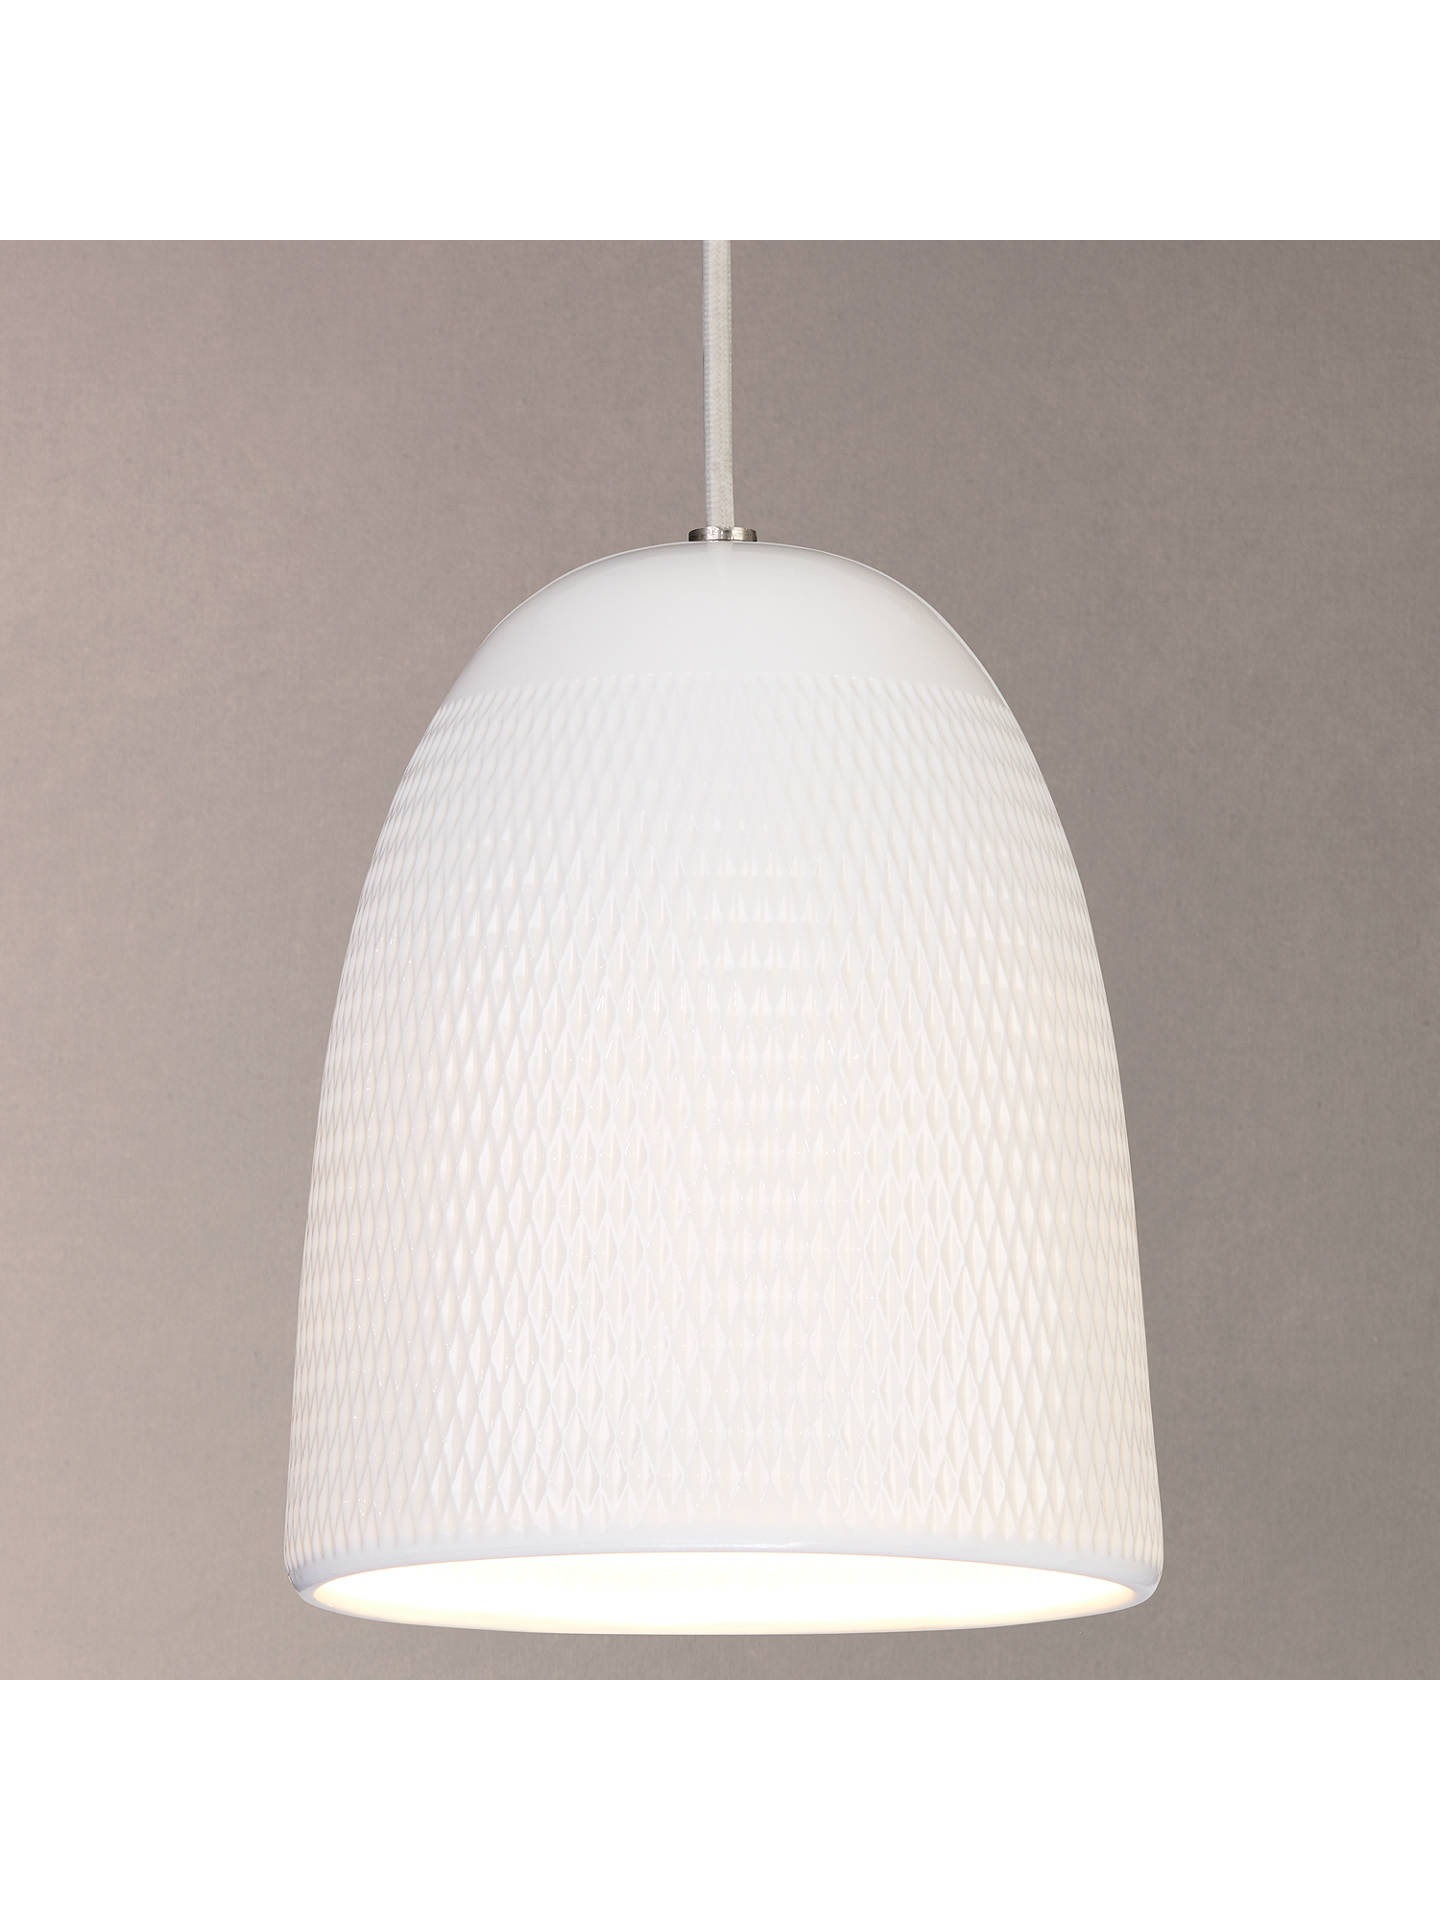 John Lewis Fitcham Textured Porcelain Pendant Ceiling Light White Fixture Wiring Diagram Buyjohn Online At